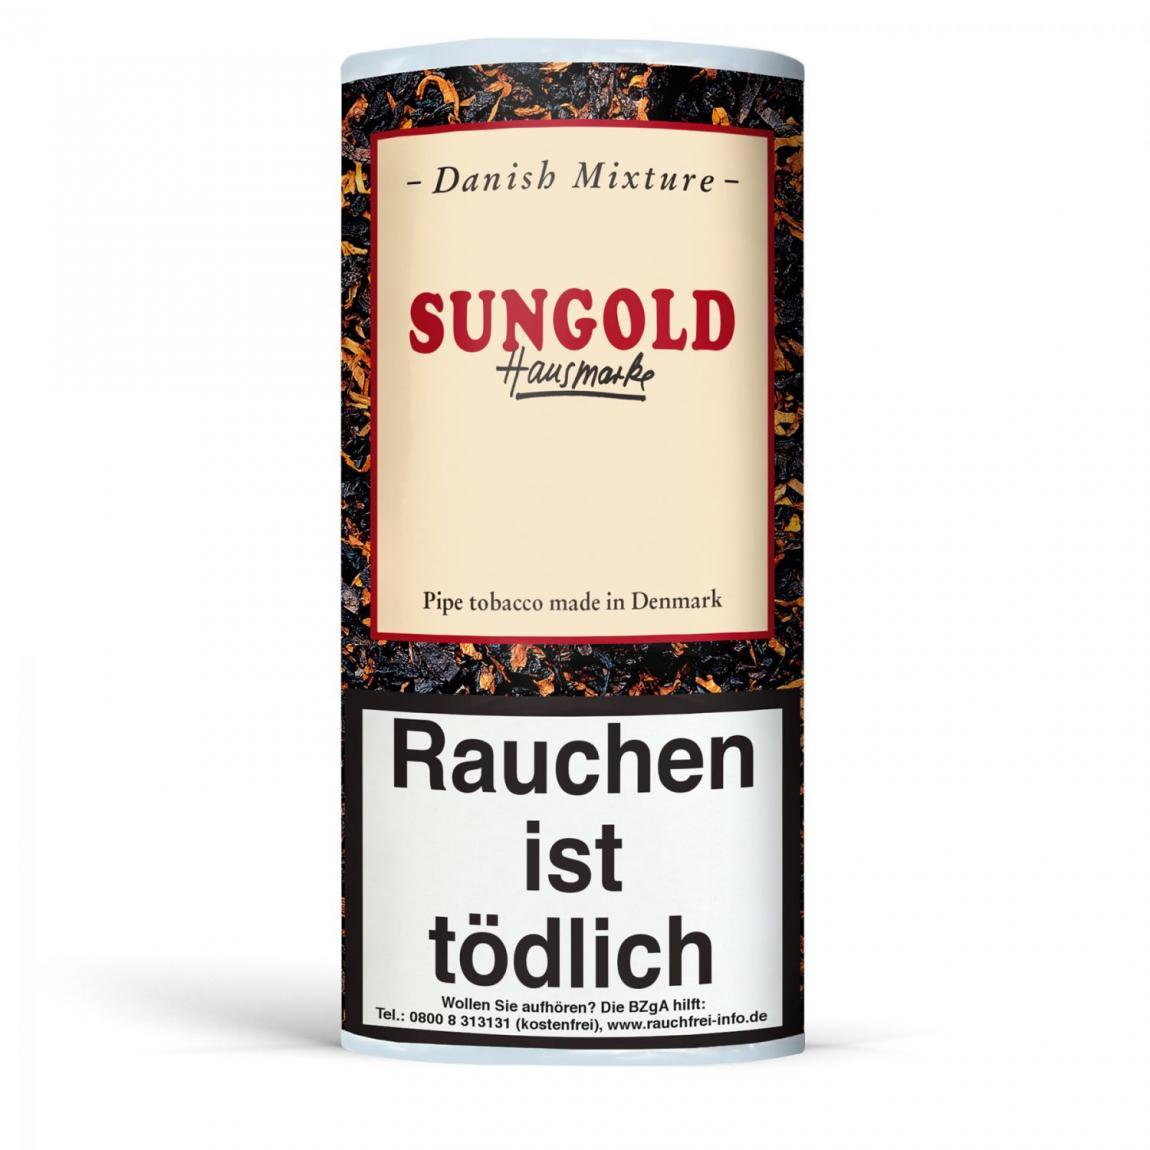 Hausmarke »Danish Mixture Sungold« 50g Pouch